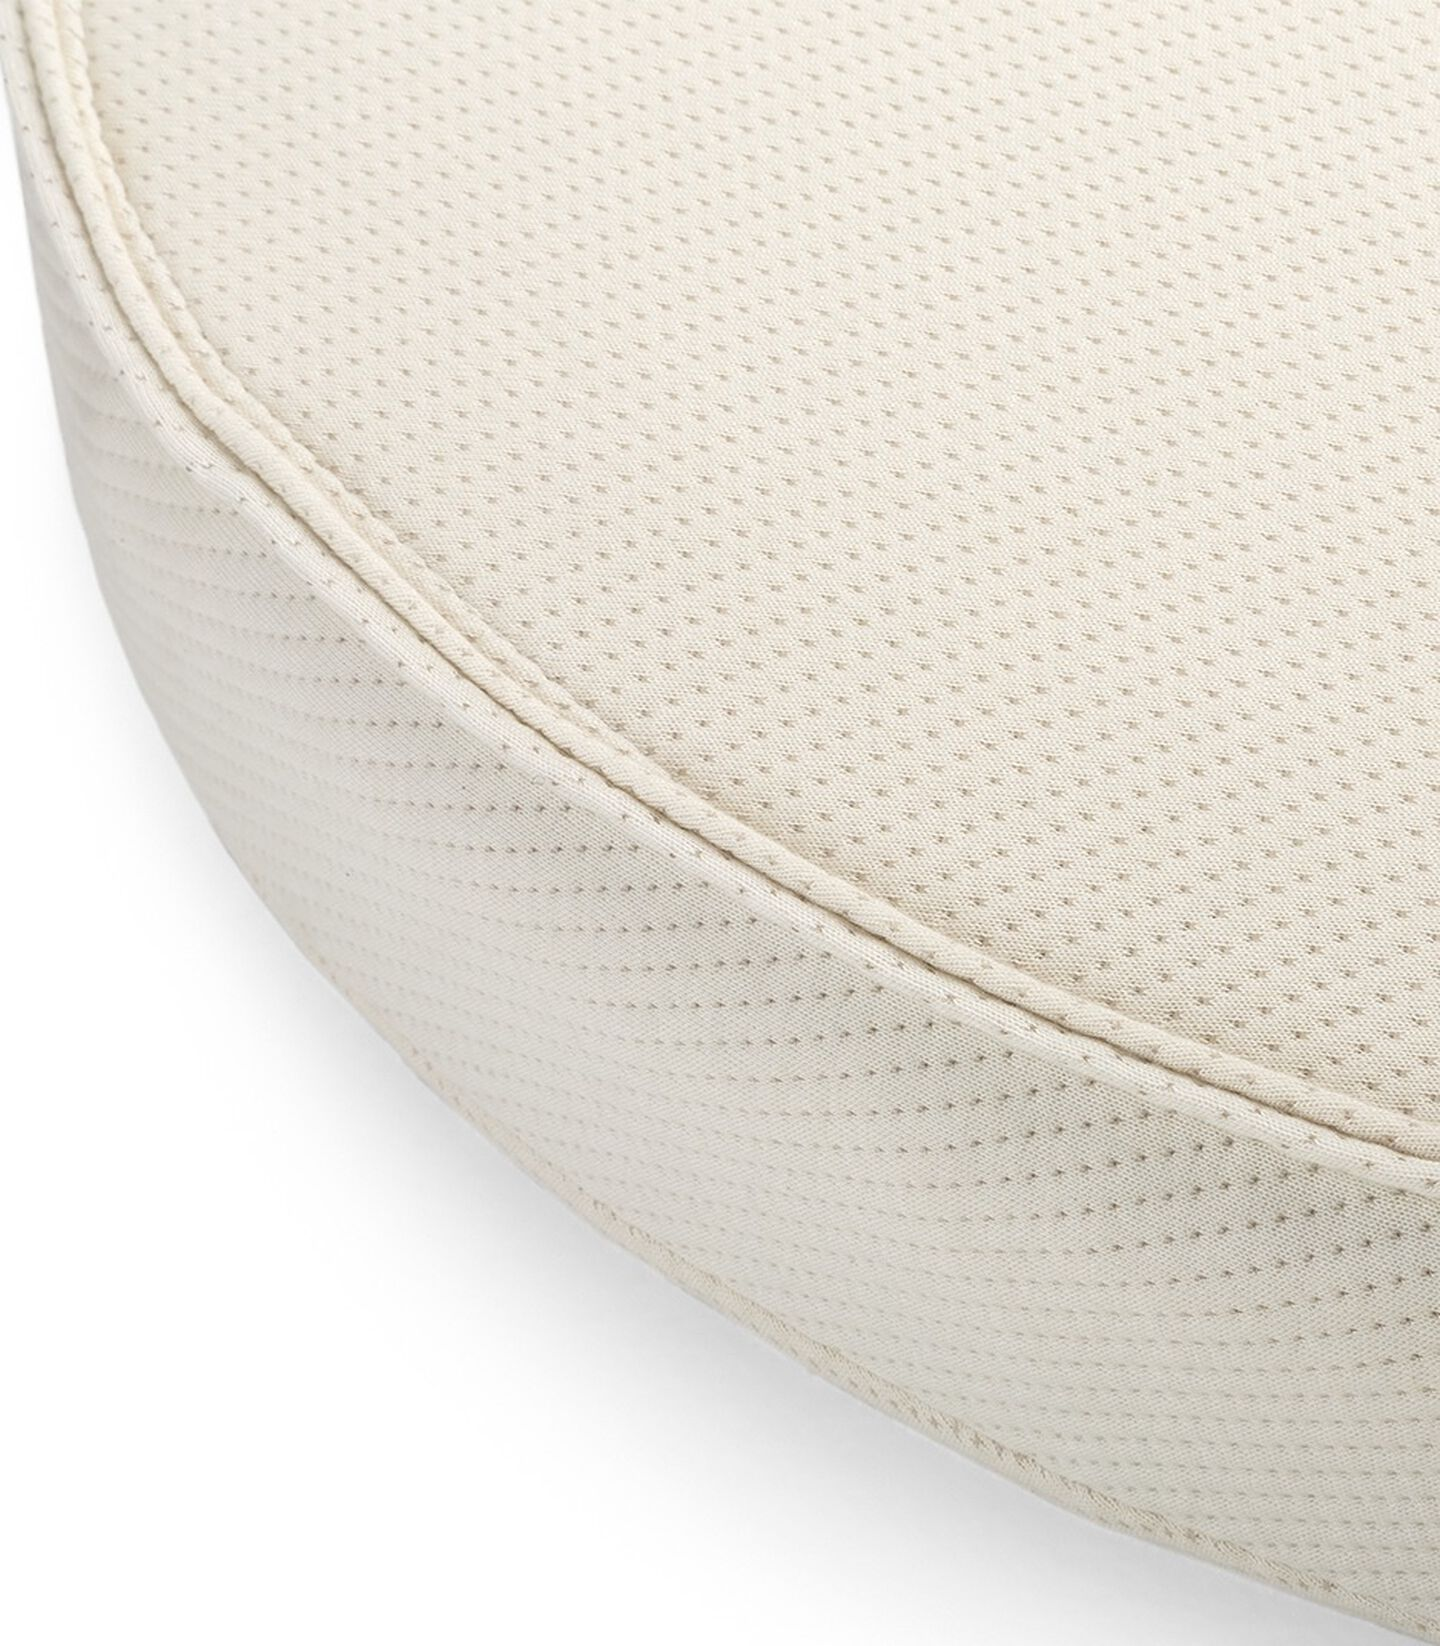 Stokke® Sleepi™ Bed Mattress. Organic. US version.